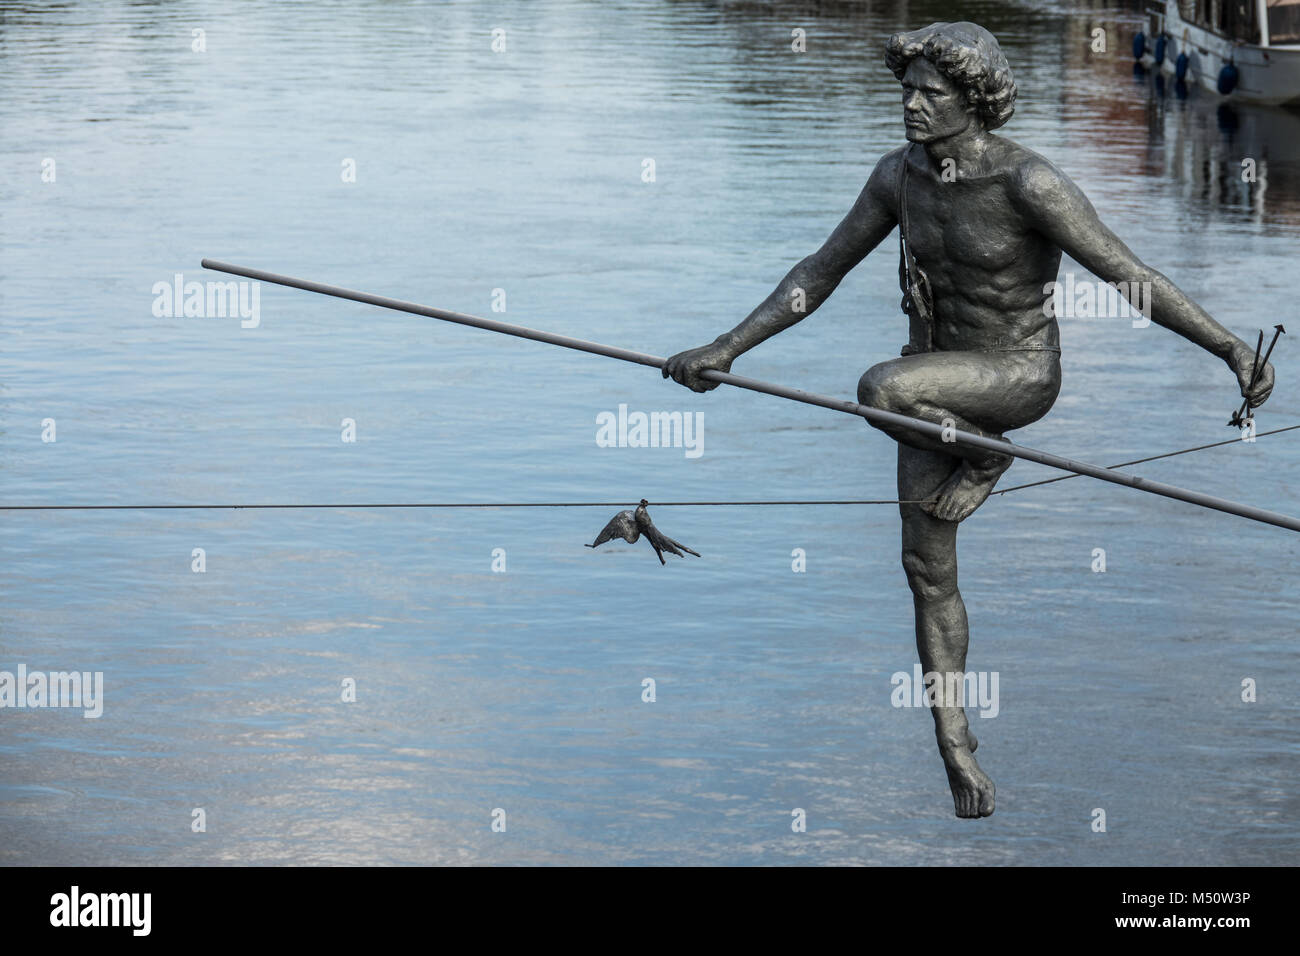 The tightrope walker sculpture closeup - Stock Image